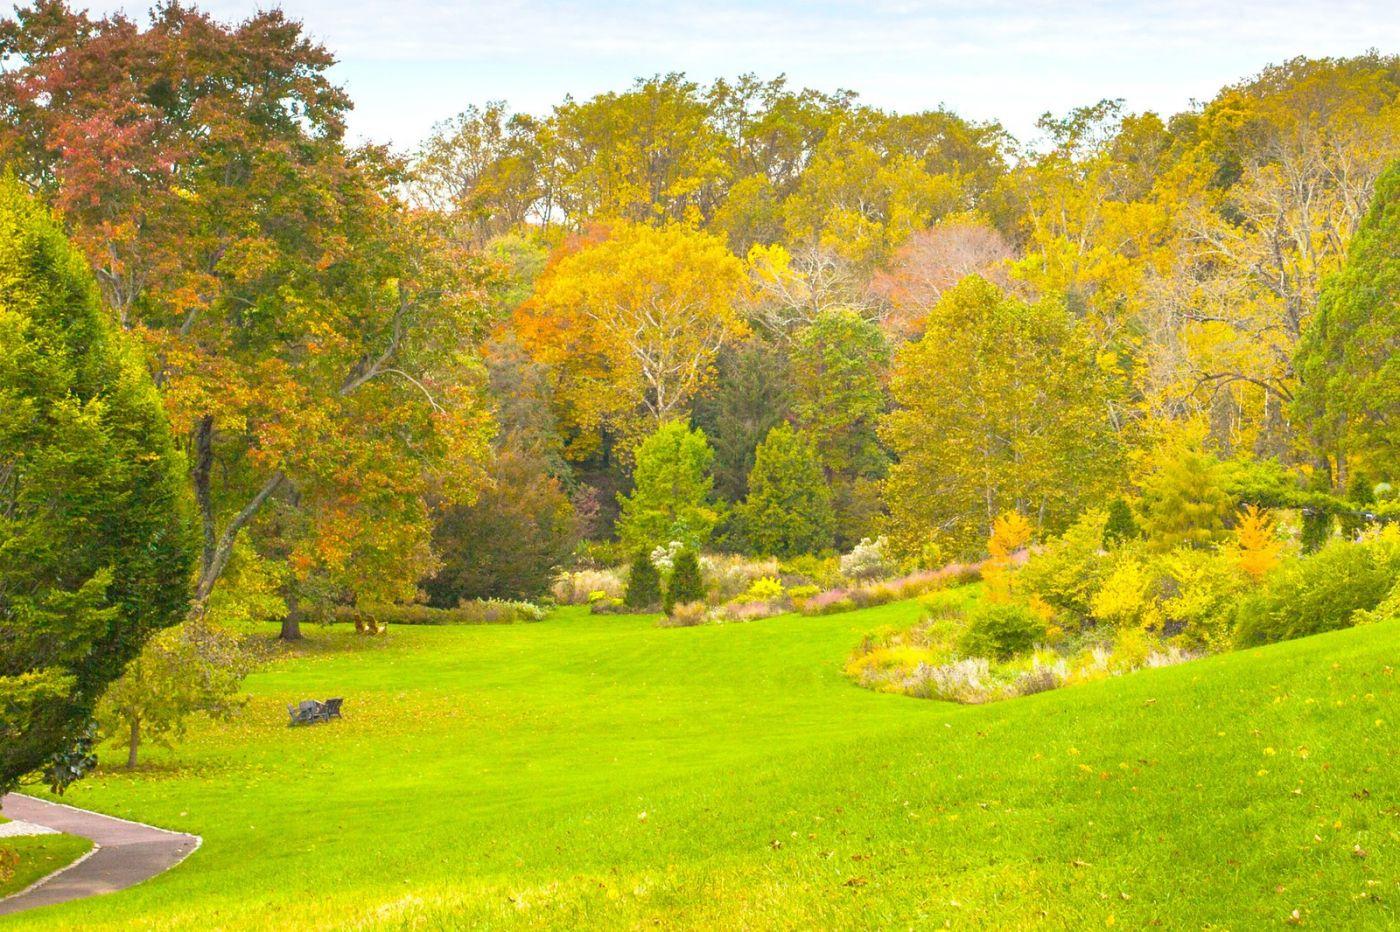 Chanticleer花园,季季有色彩_图1-11